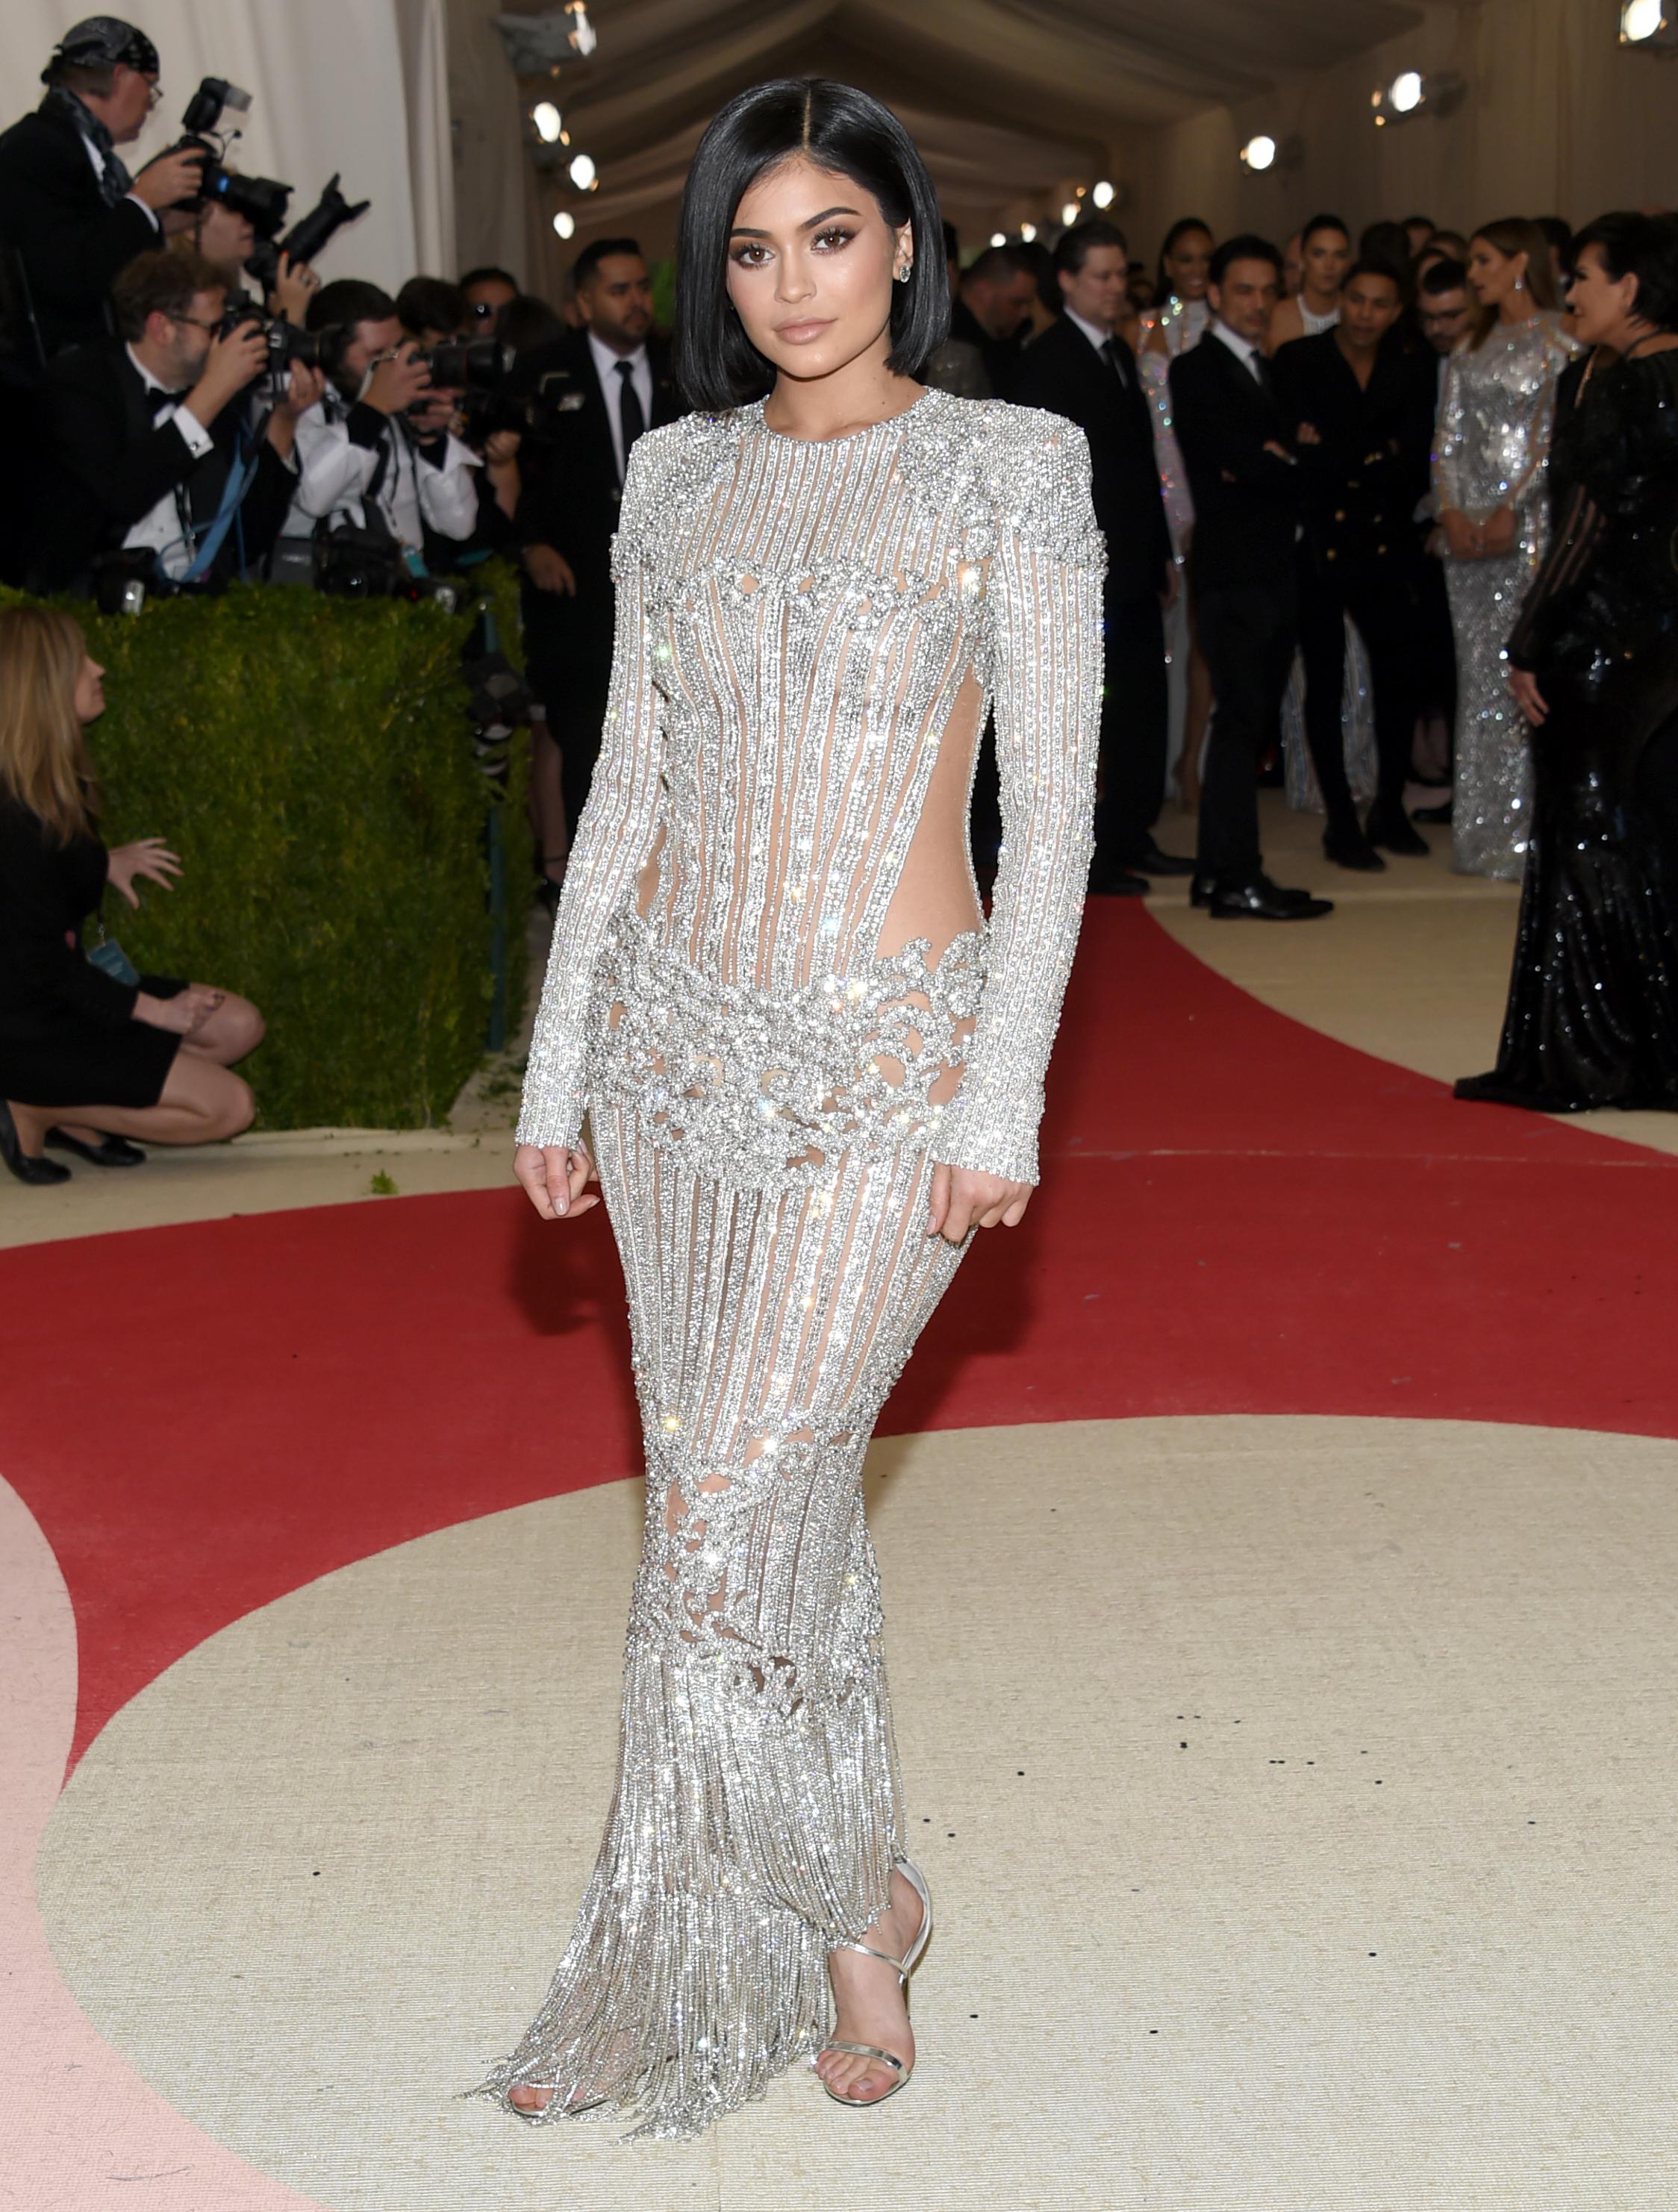 0179666020 Dolorosa la moda de Kylie Jenner